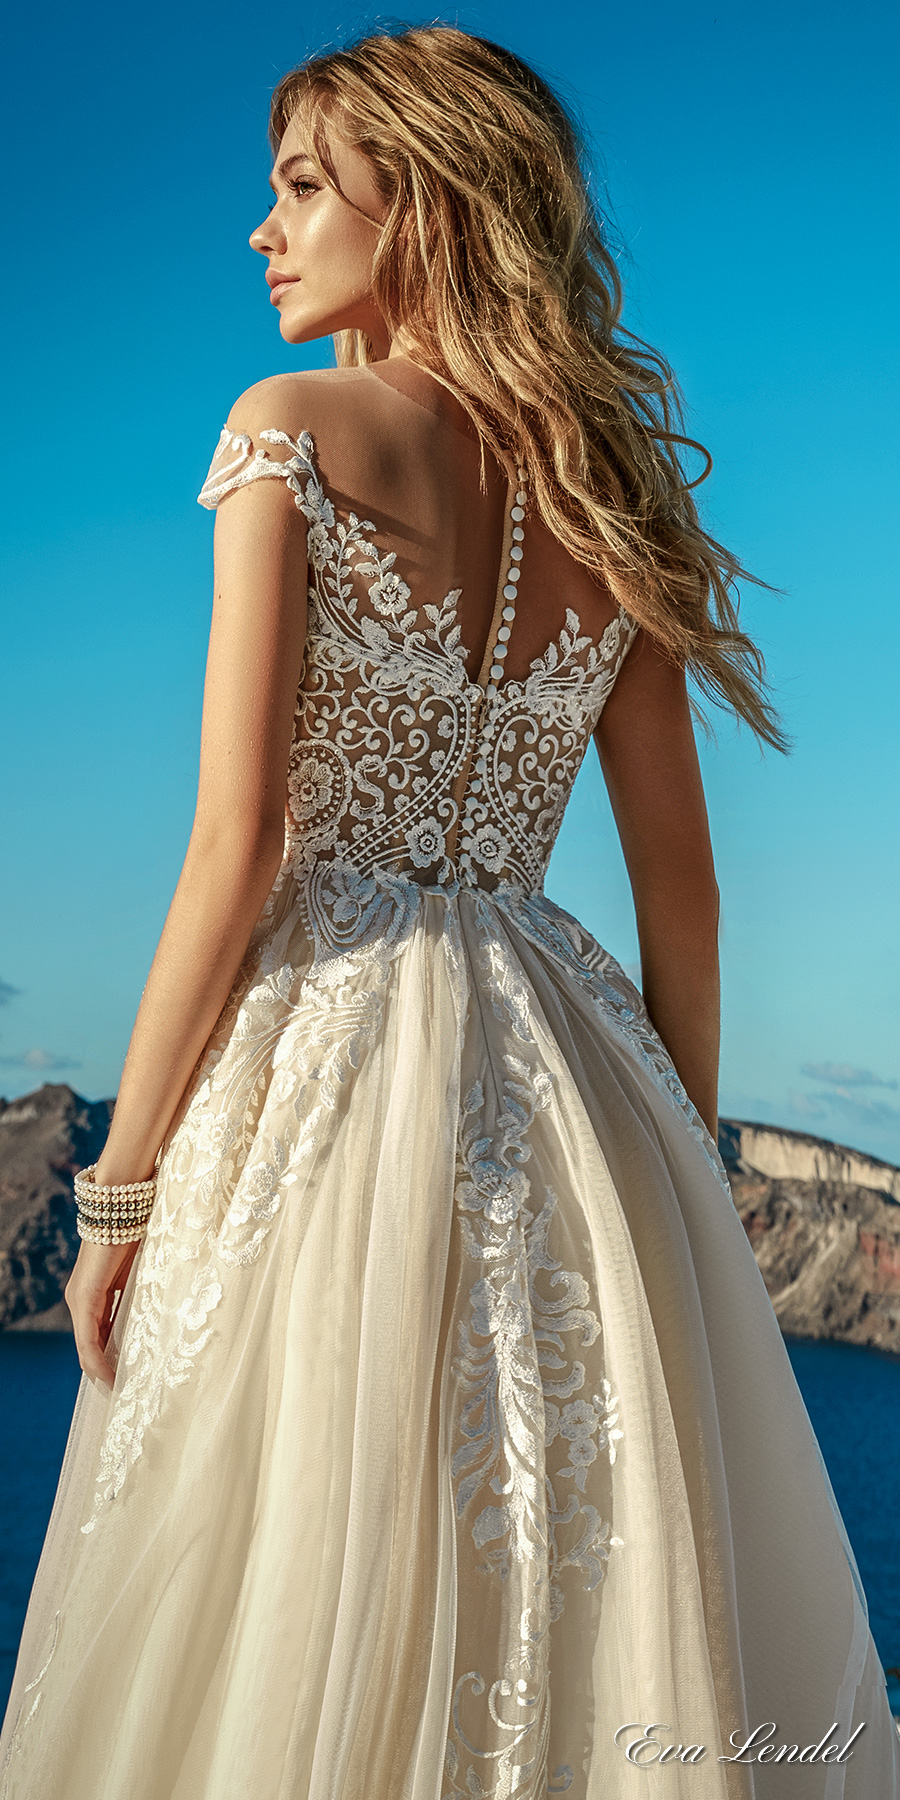 Eva lendel 39 s 2017 bridal collection crazyforus for Ivory color wedding dress